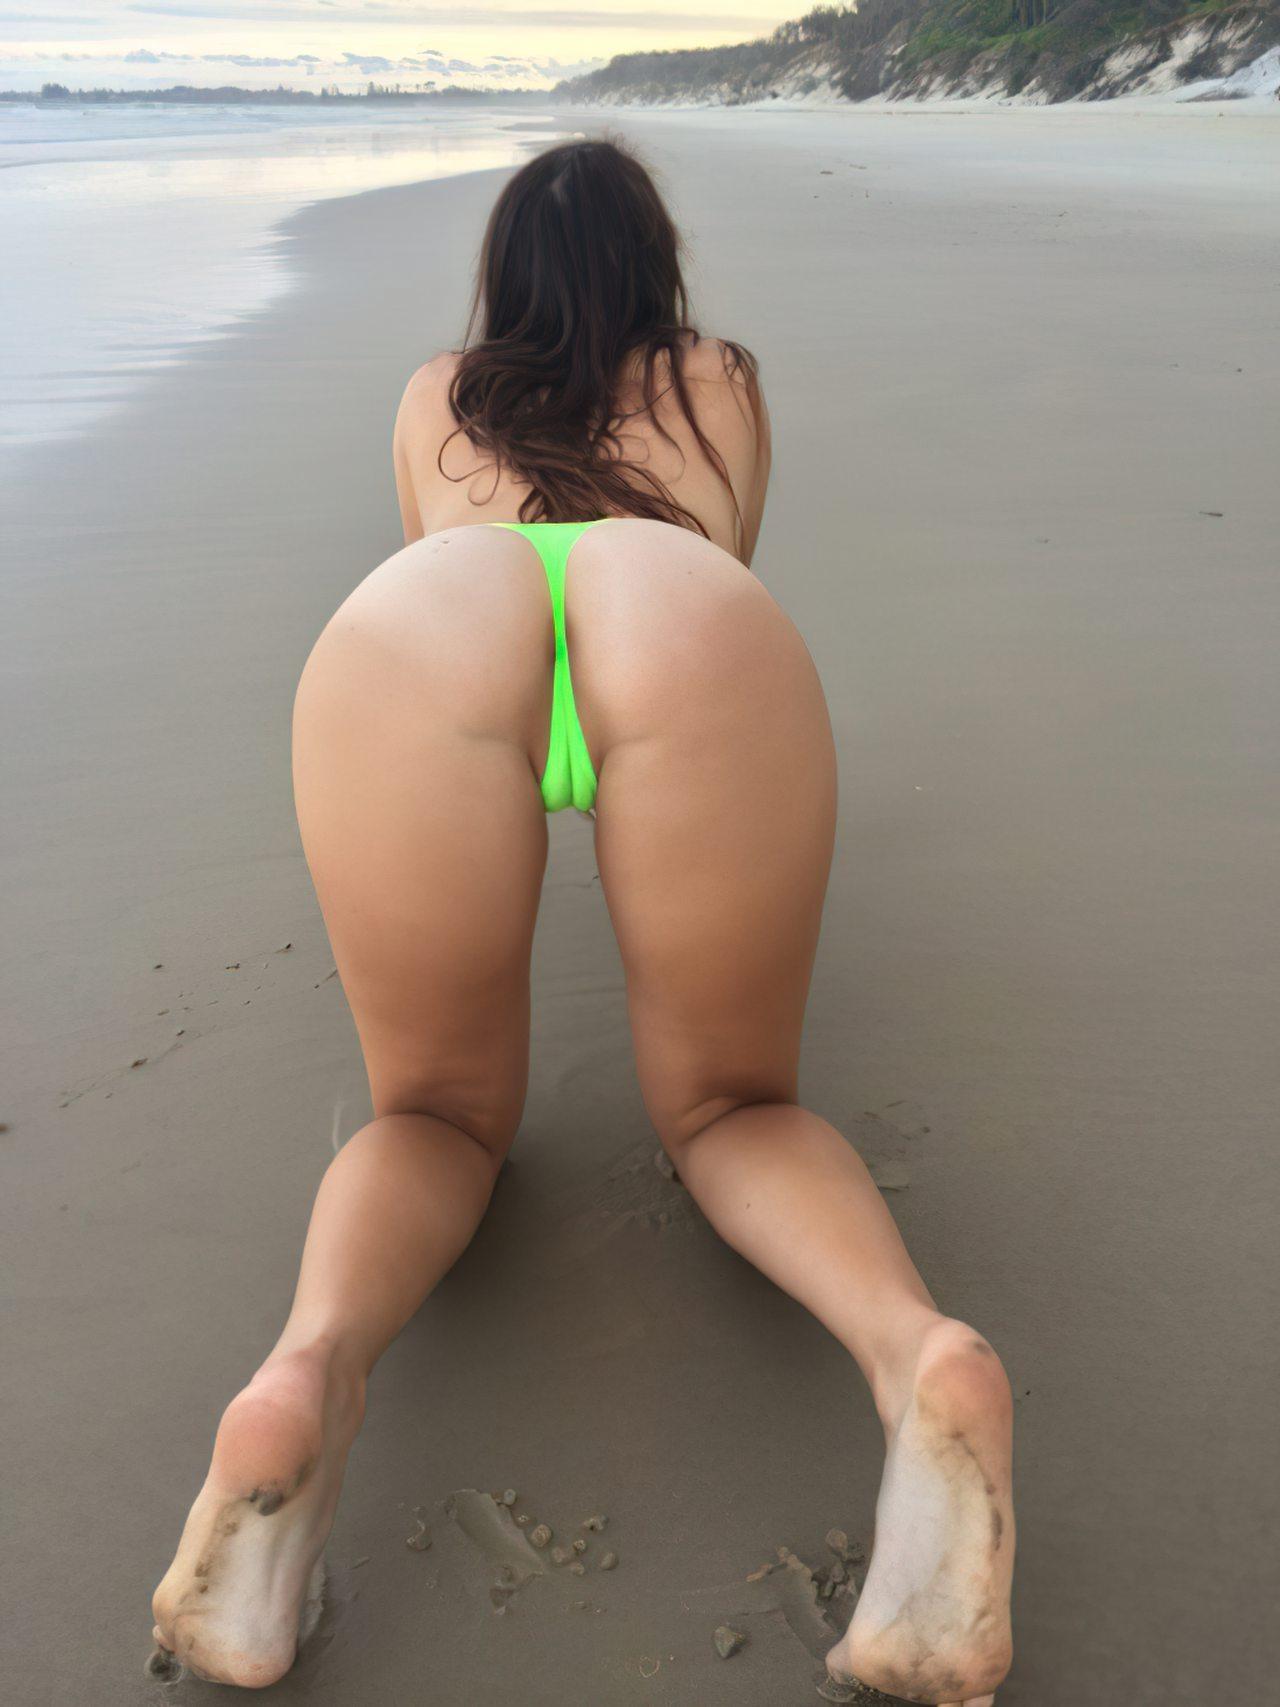 Passeio na Praia (3)